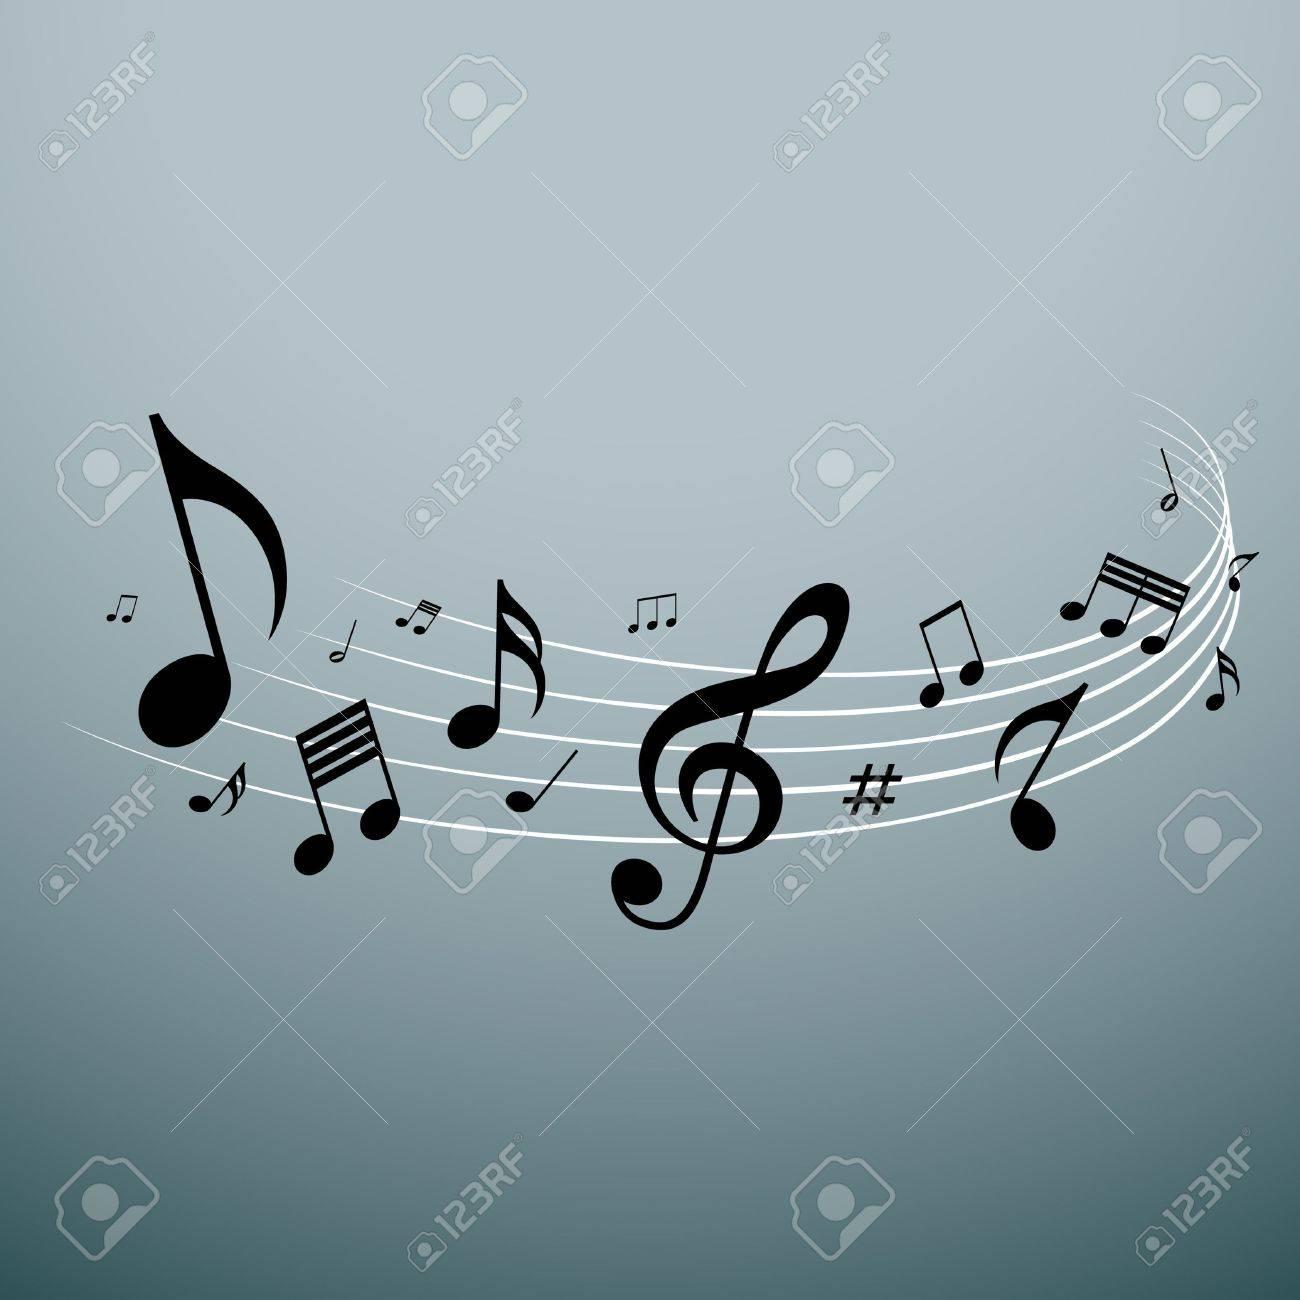 Musical notes design, vector illustration Stock Vector - 21989824